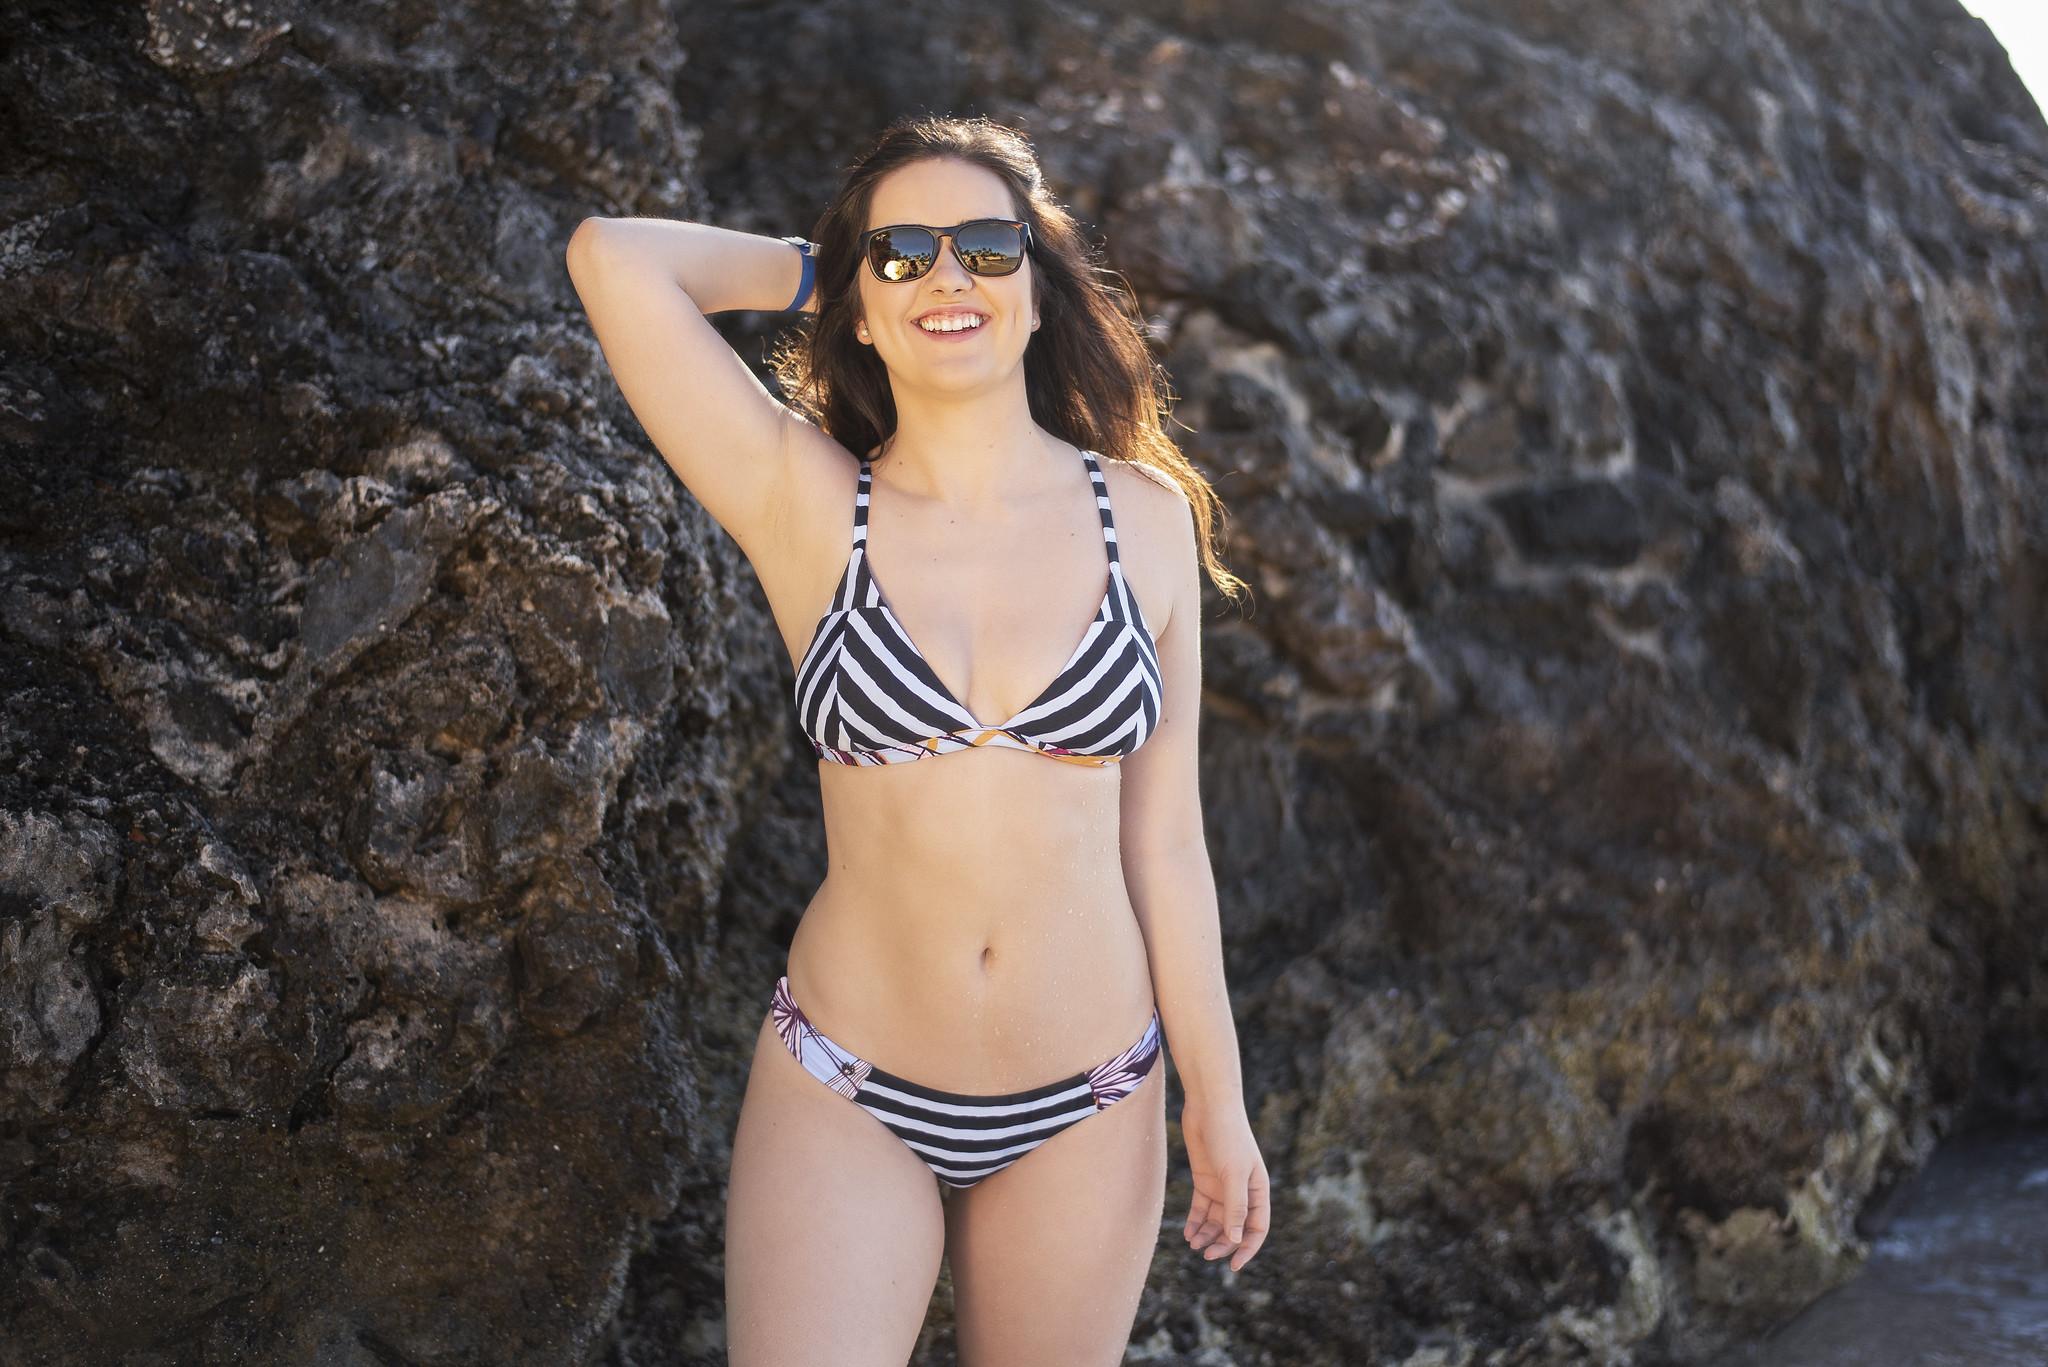 marie-chloe falardeau bikini maaji cuba rocher